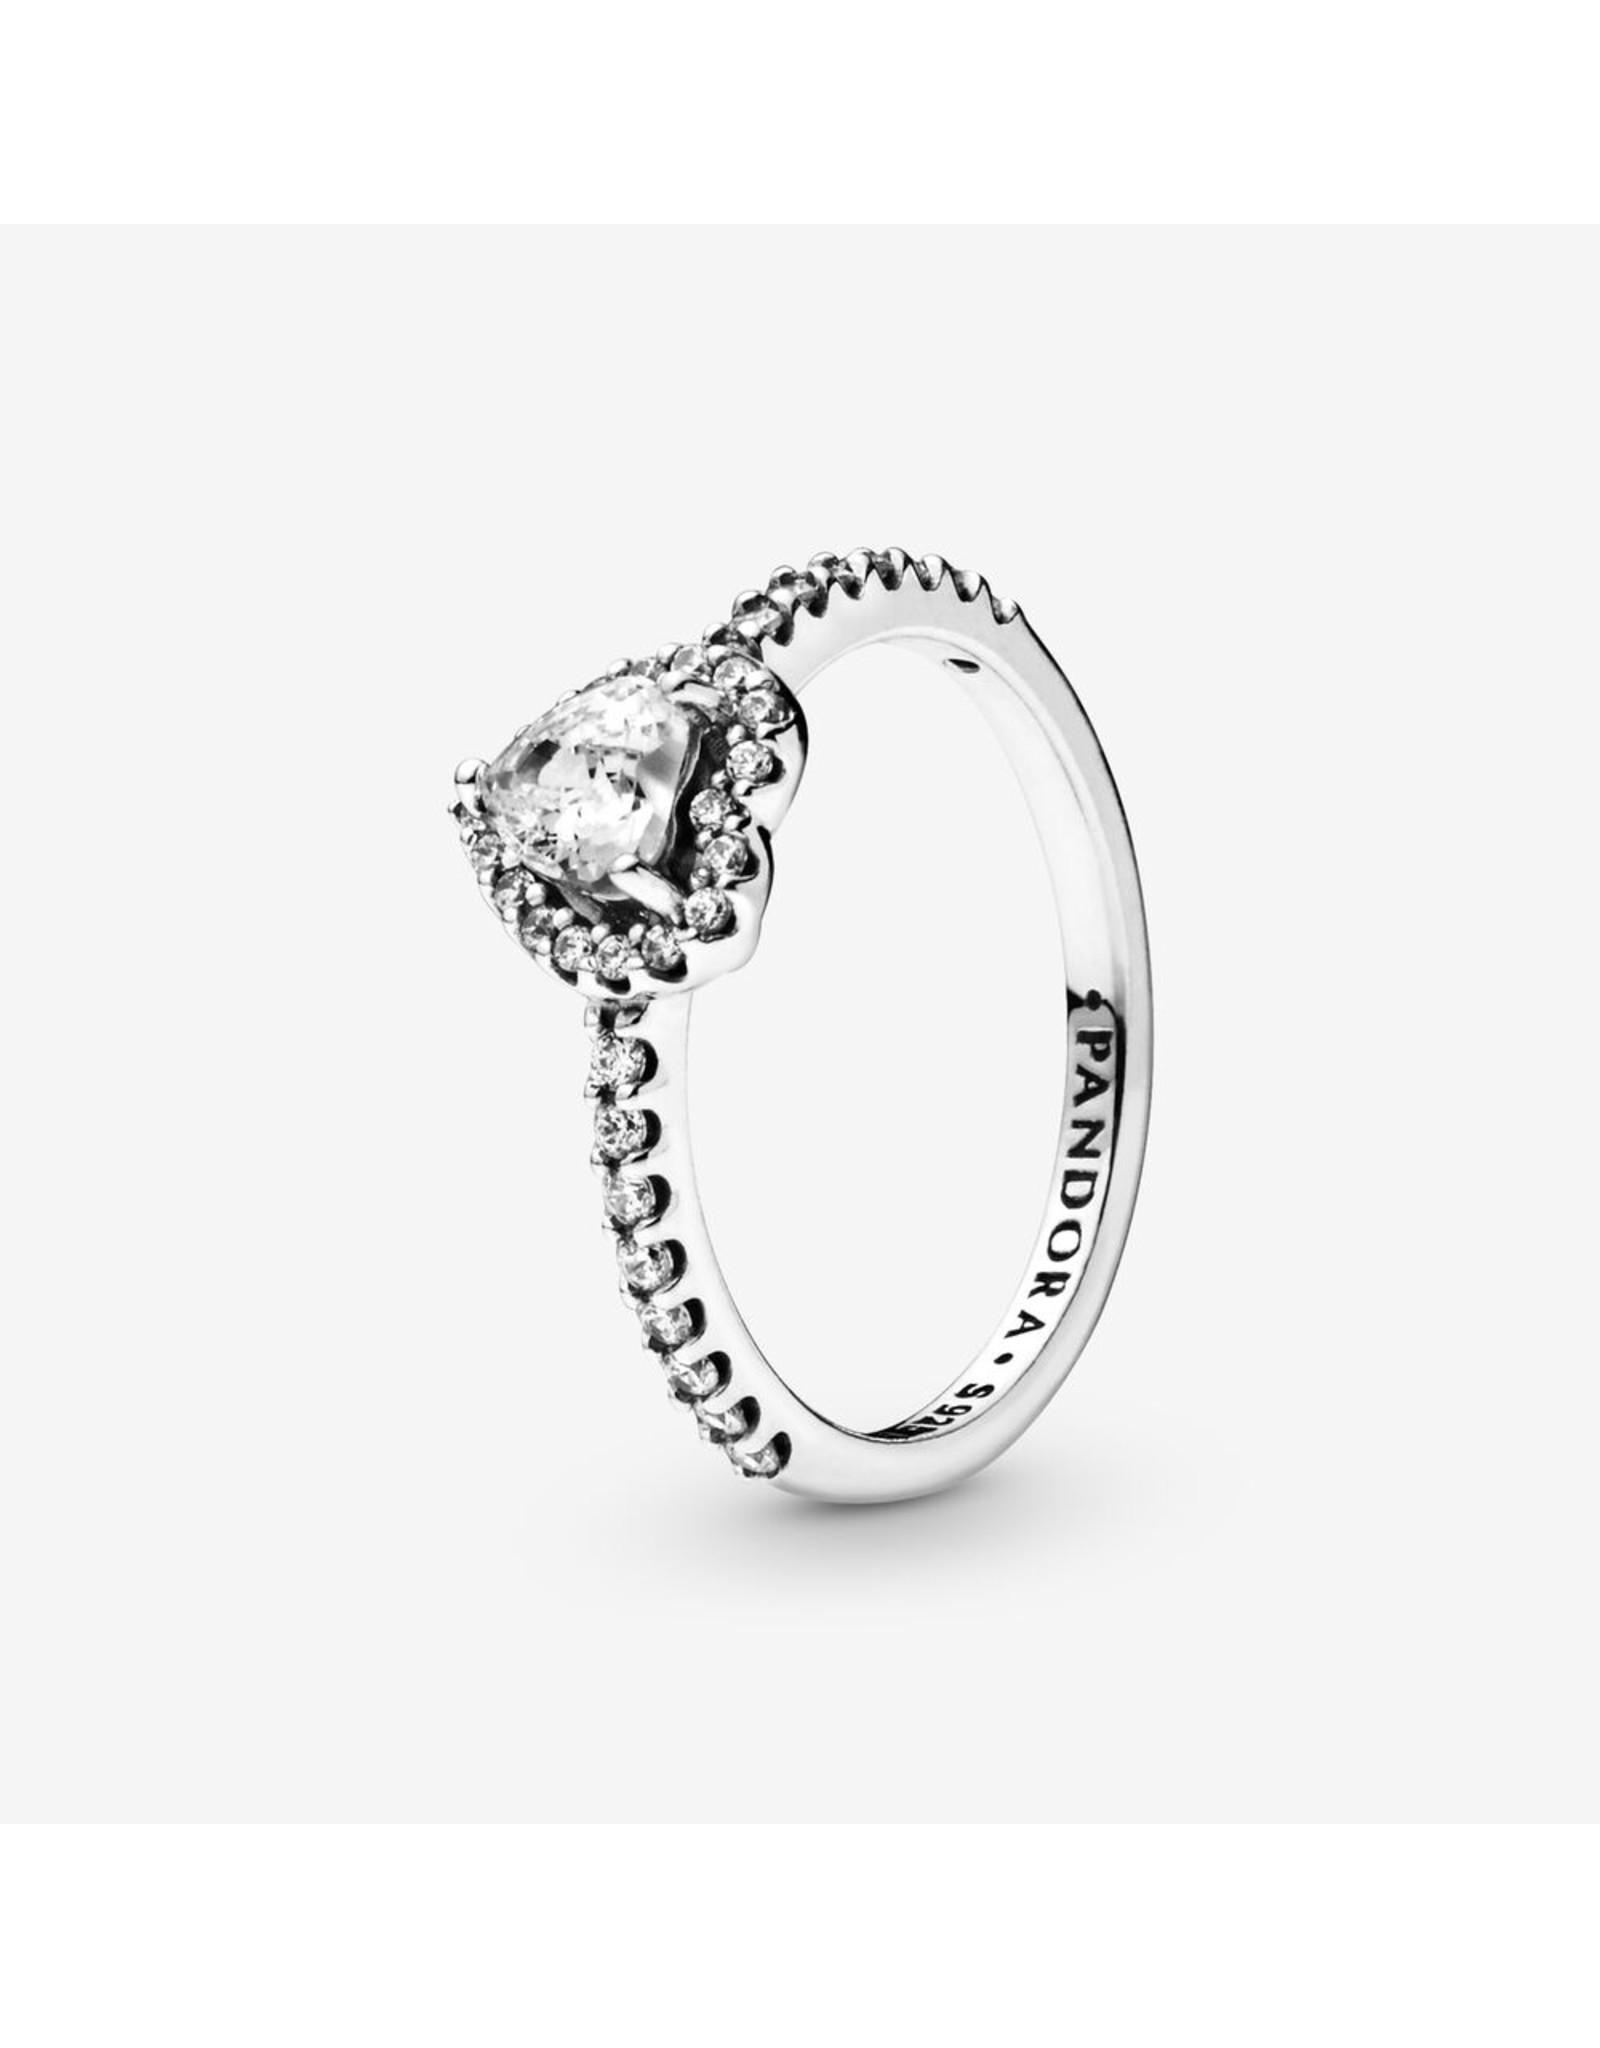 Pandora Pandora Ring, (198421C01) Elevated Heart, Clear CZ